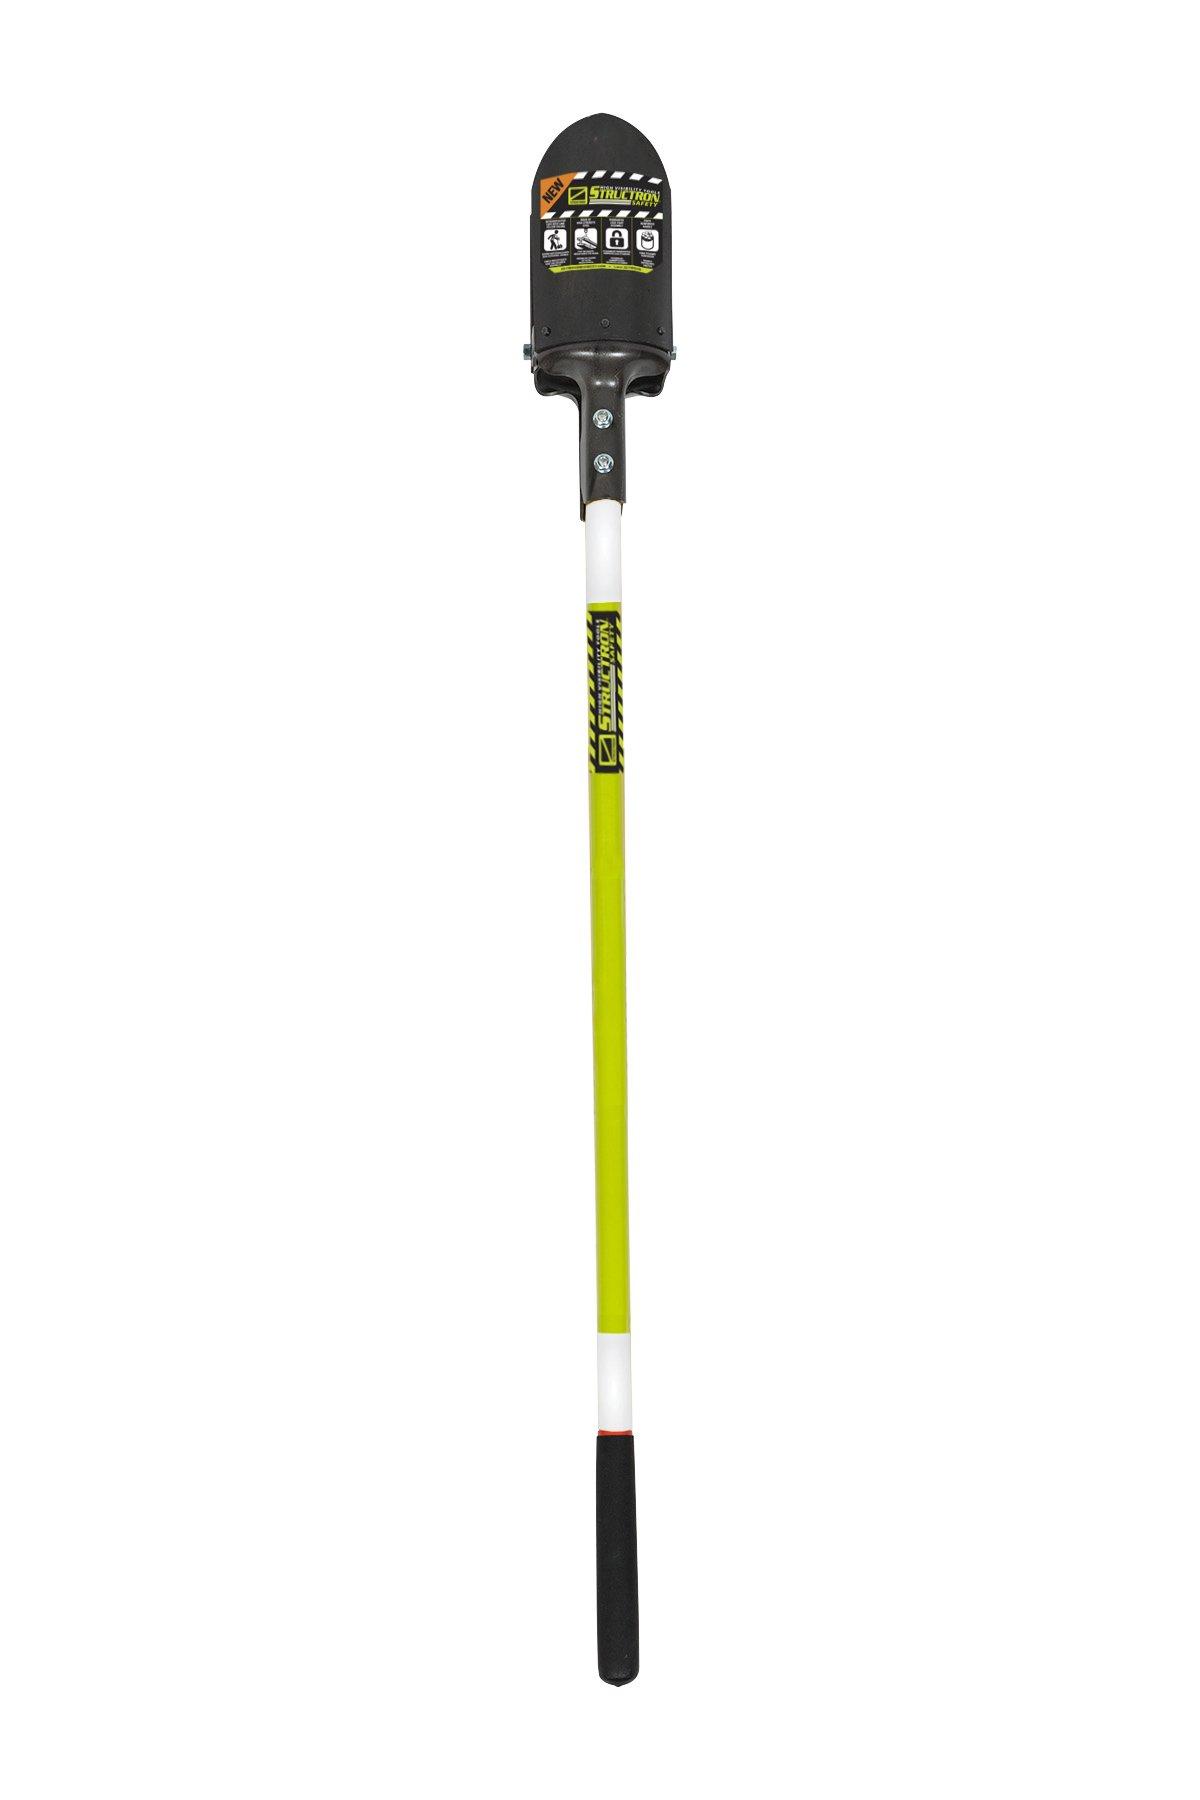 Structron 49753 Seymour Safety Hercules Digger 48'' Fiberglass Handle and Pro Grip Comfort Grip